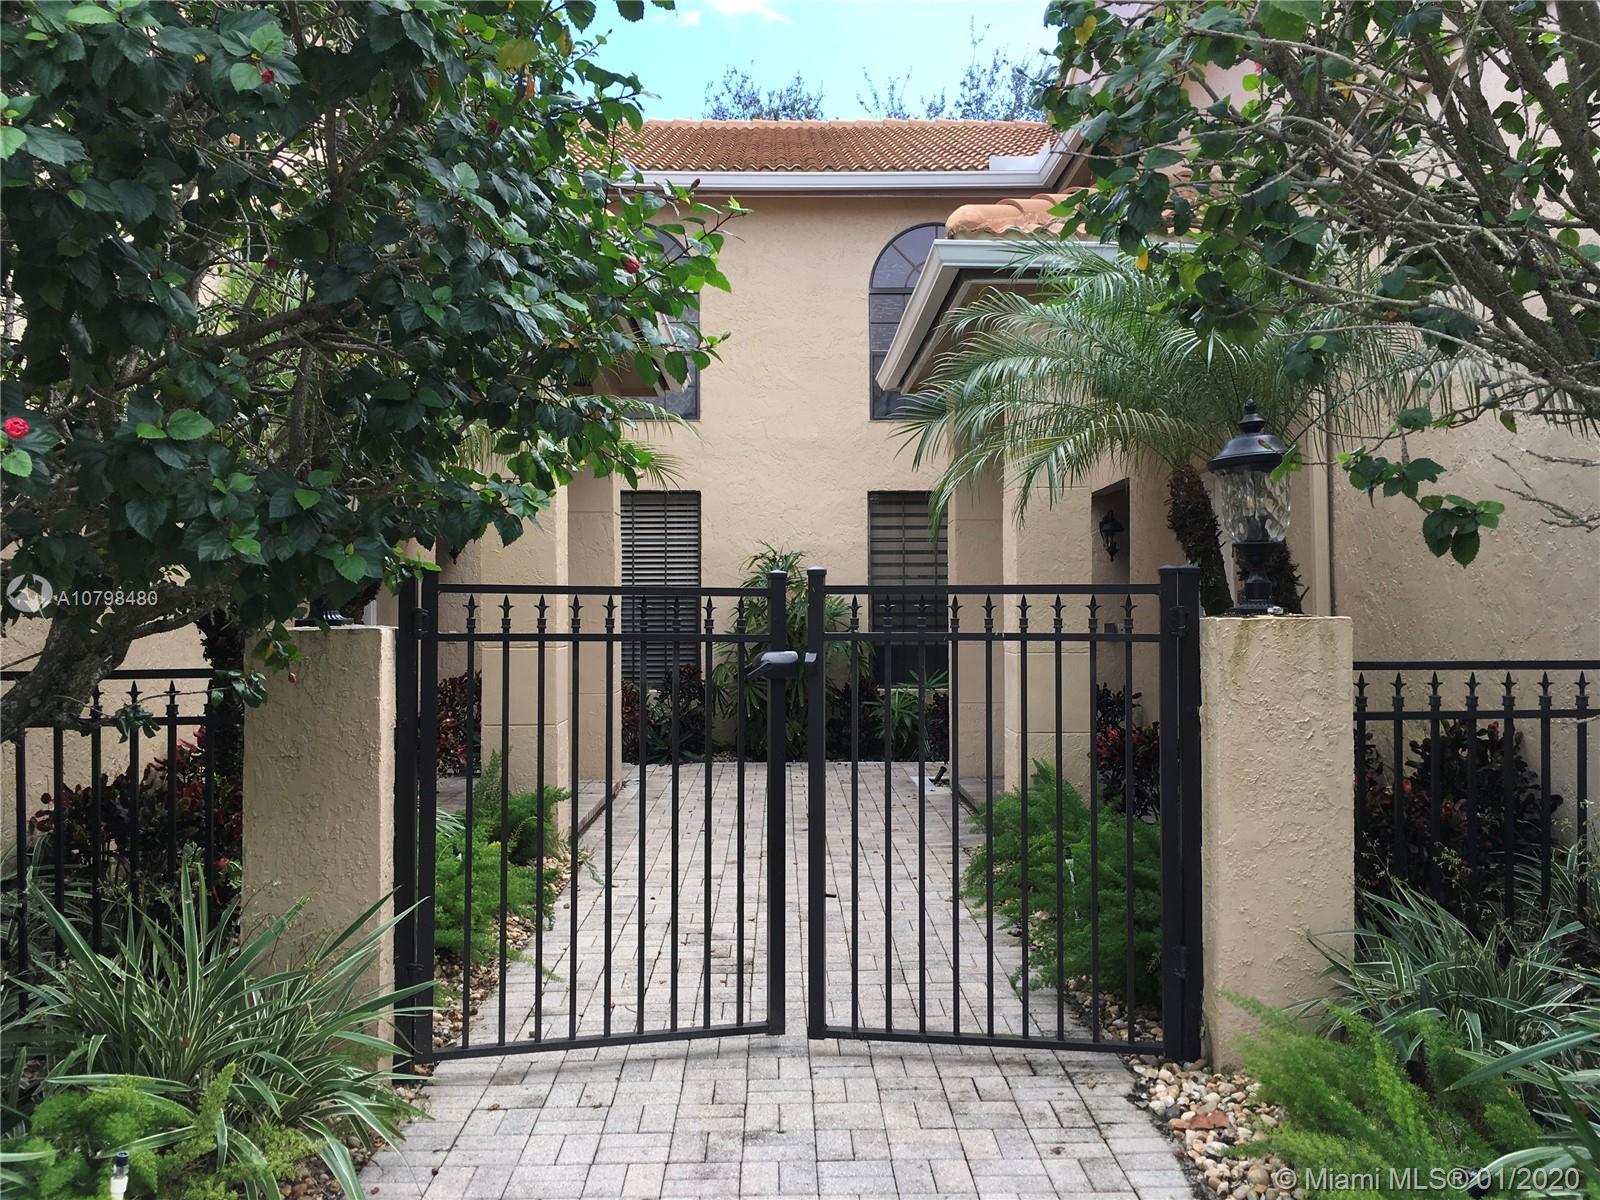 6675 Montego Bay Blvd #F, Boca Raton, FL 33433 - Boca Raton, FL real estate listing